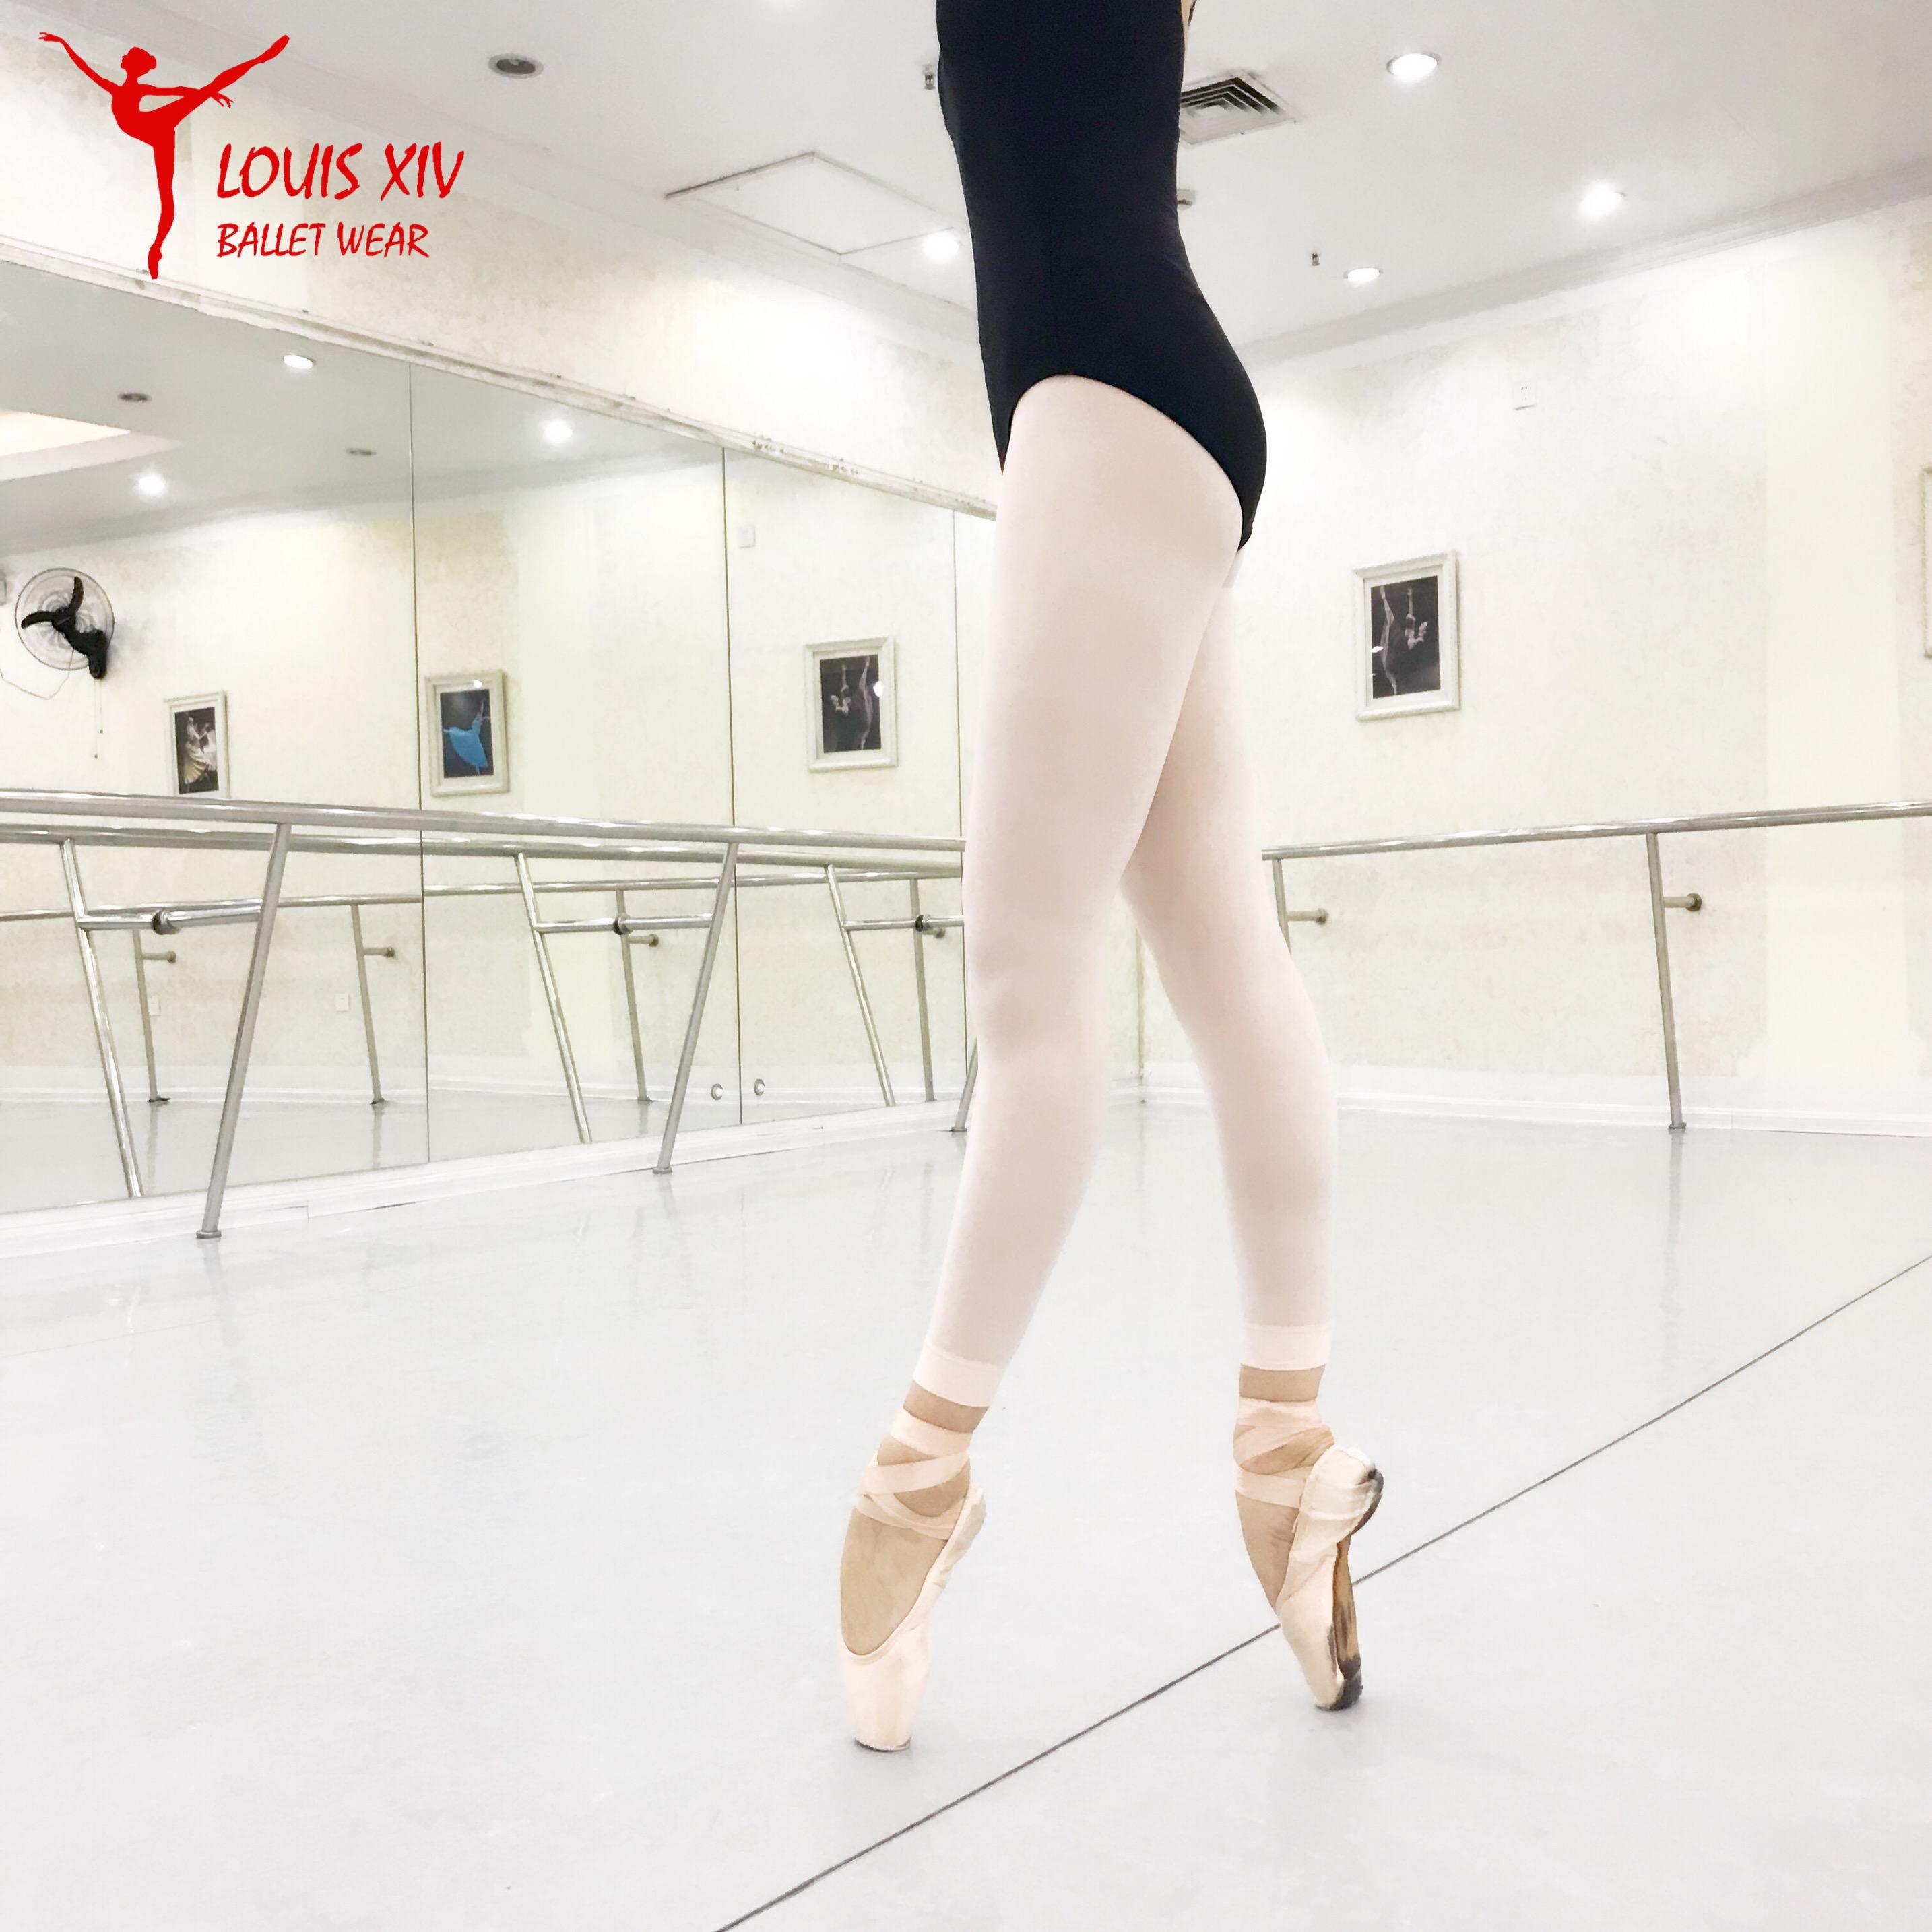 LOUIS XIV 芭蕾舞袜子成人连裤袜薄练功打底裤袜舞蹈演出袜九分袜